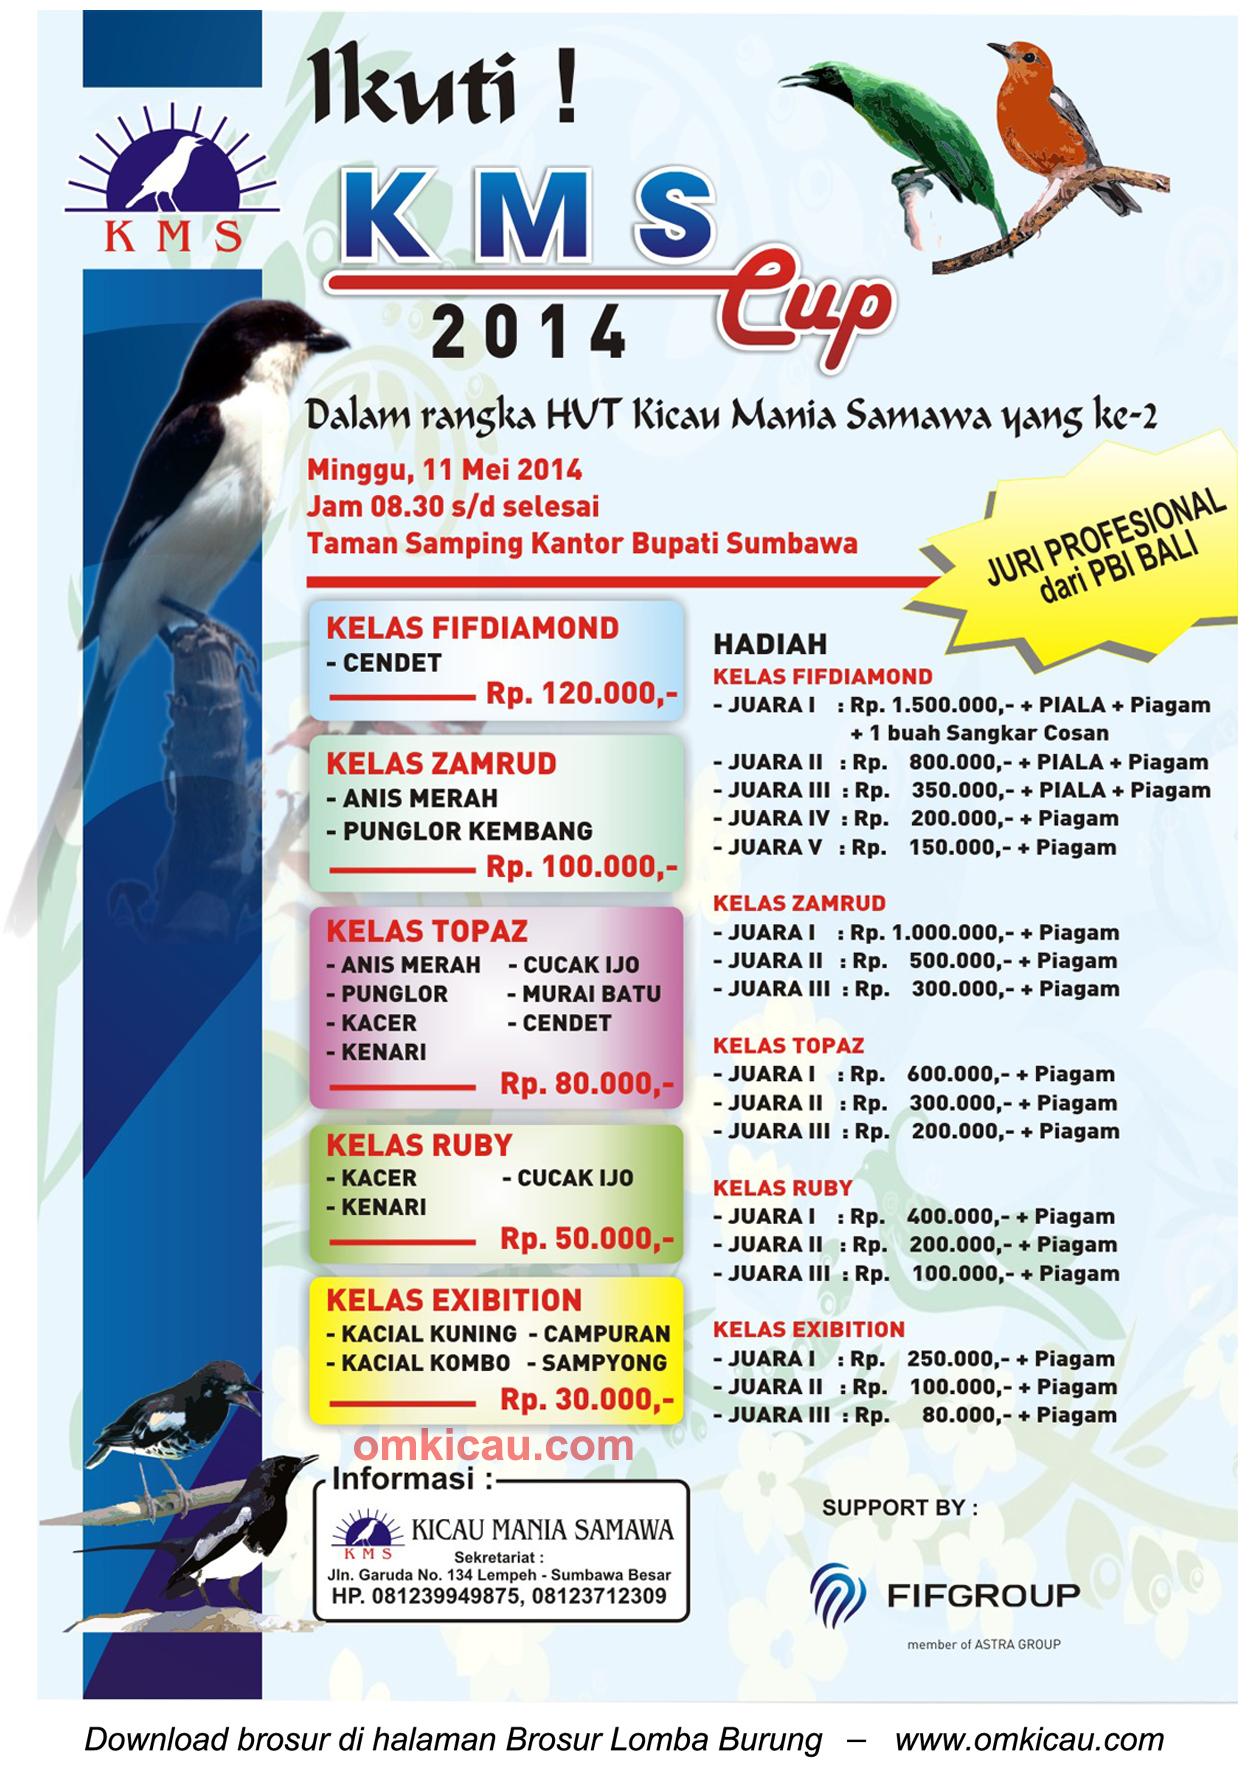 Brosur Lomba Burung Berkicau KMS Cup, Sumbawa, 11 Mei 2014